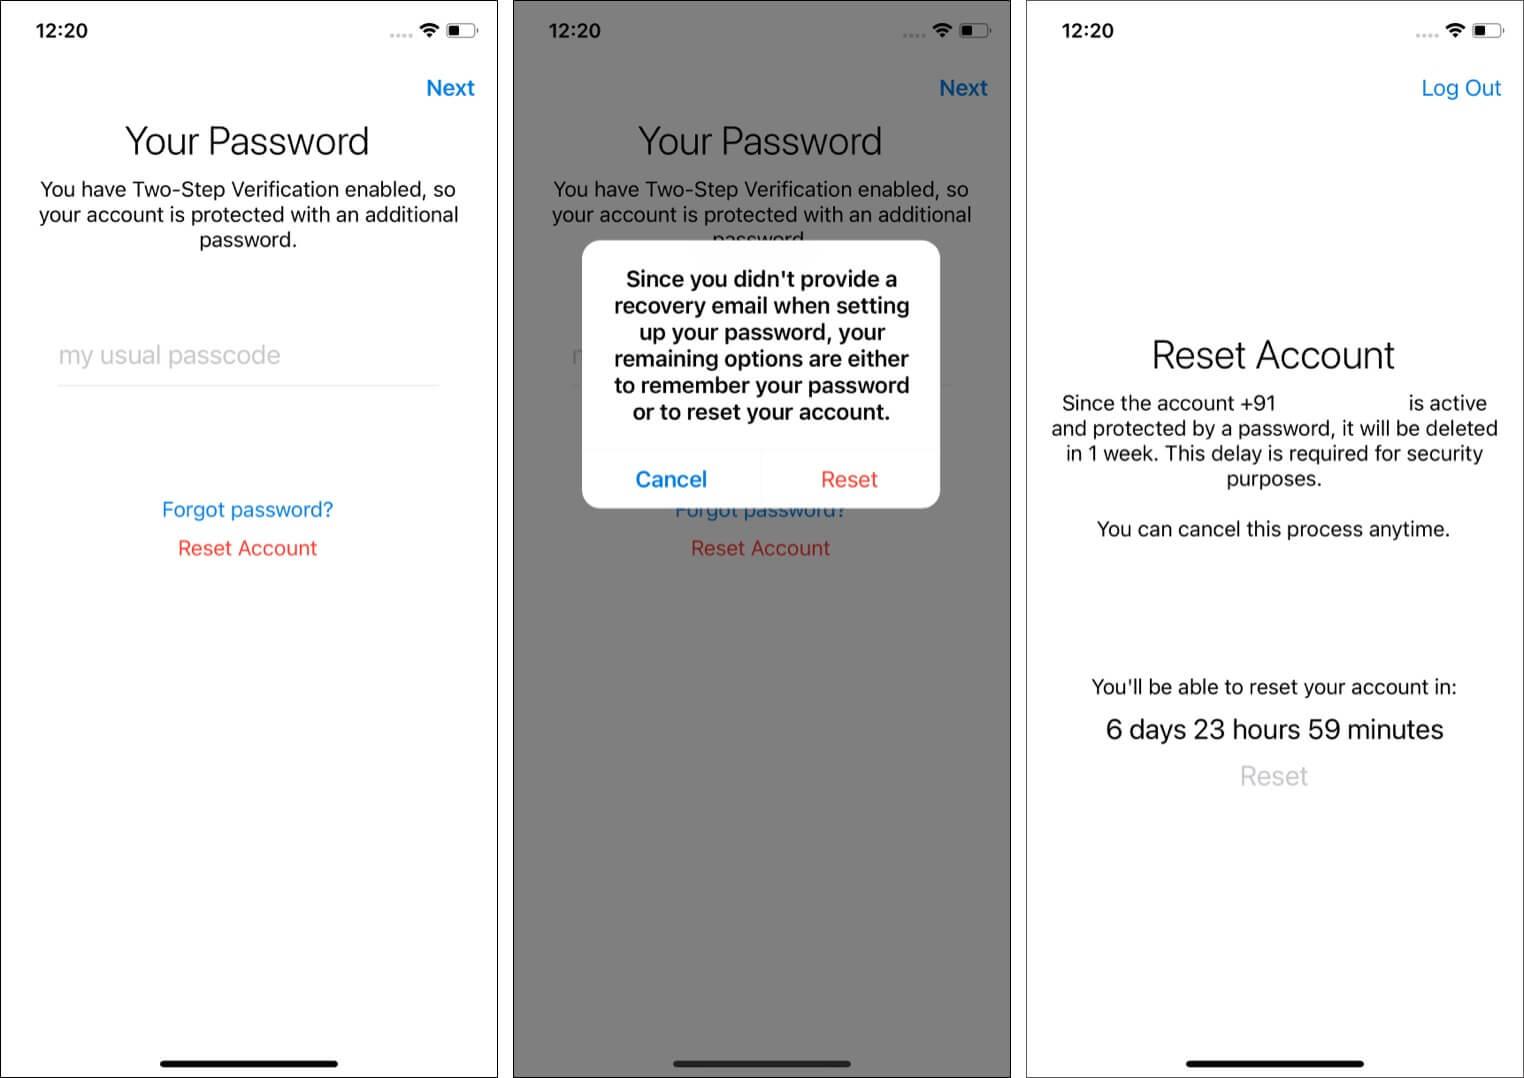 Reset Telegram account if you have Forgotten 2-step Verification Passcode